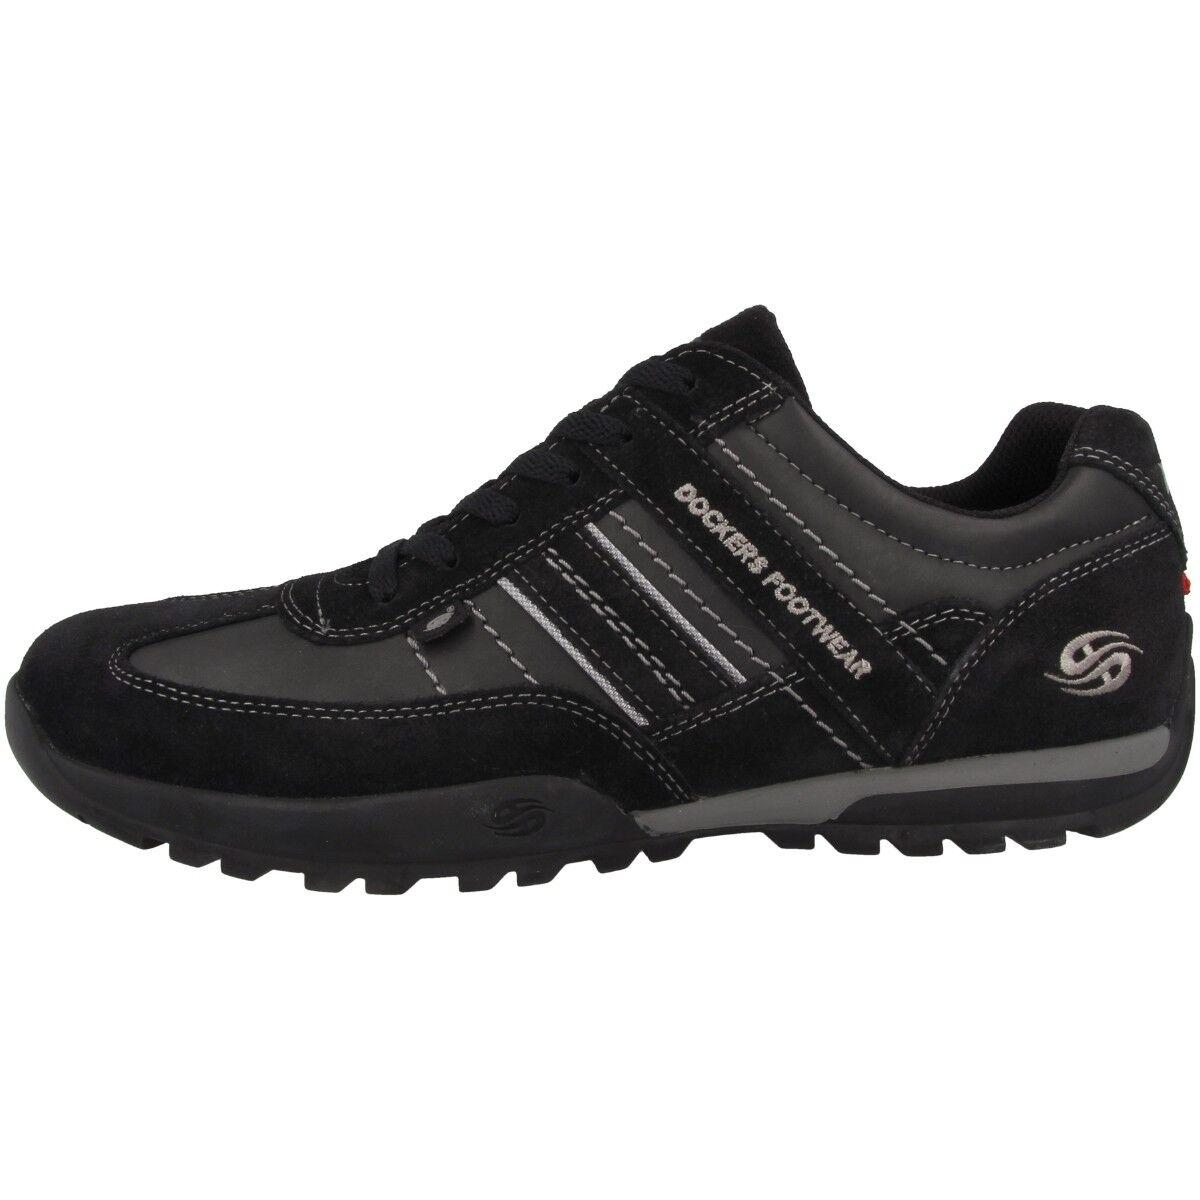 Dockers by Gerli 36ht001 zapatos Men's zapatillas Lace up negro 36ht001-204120